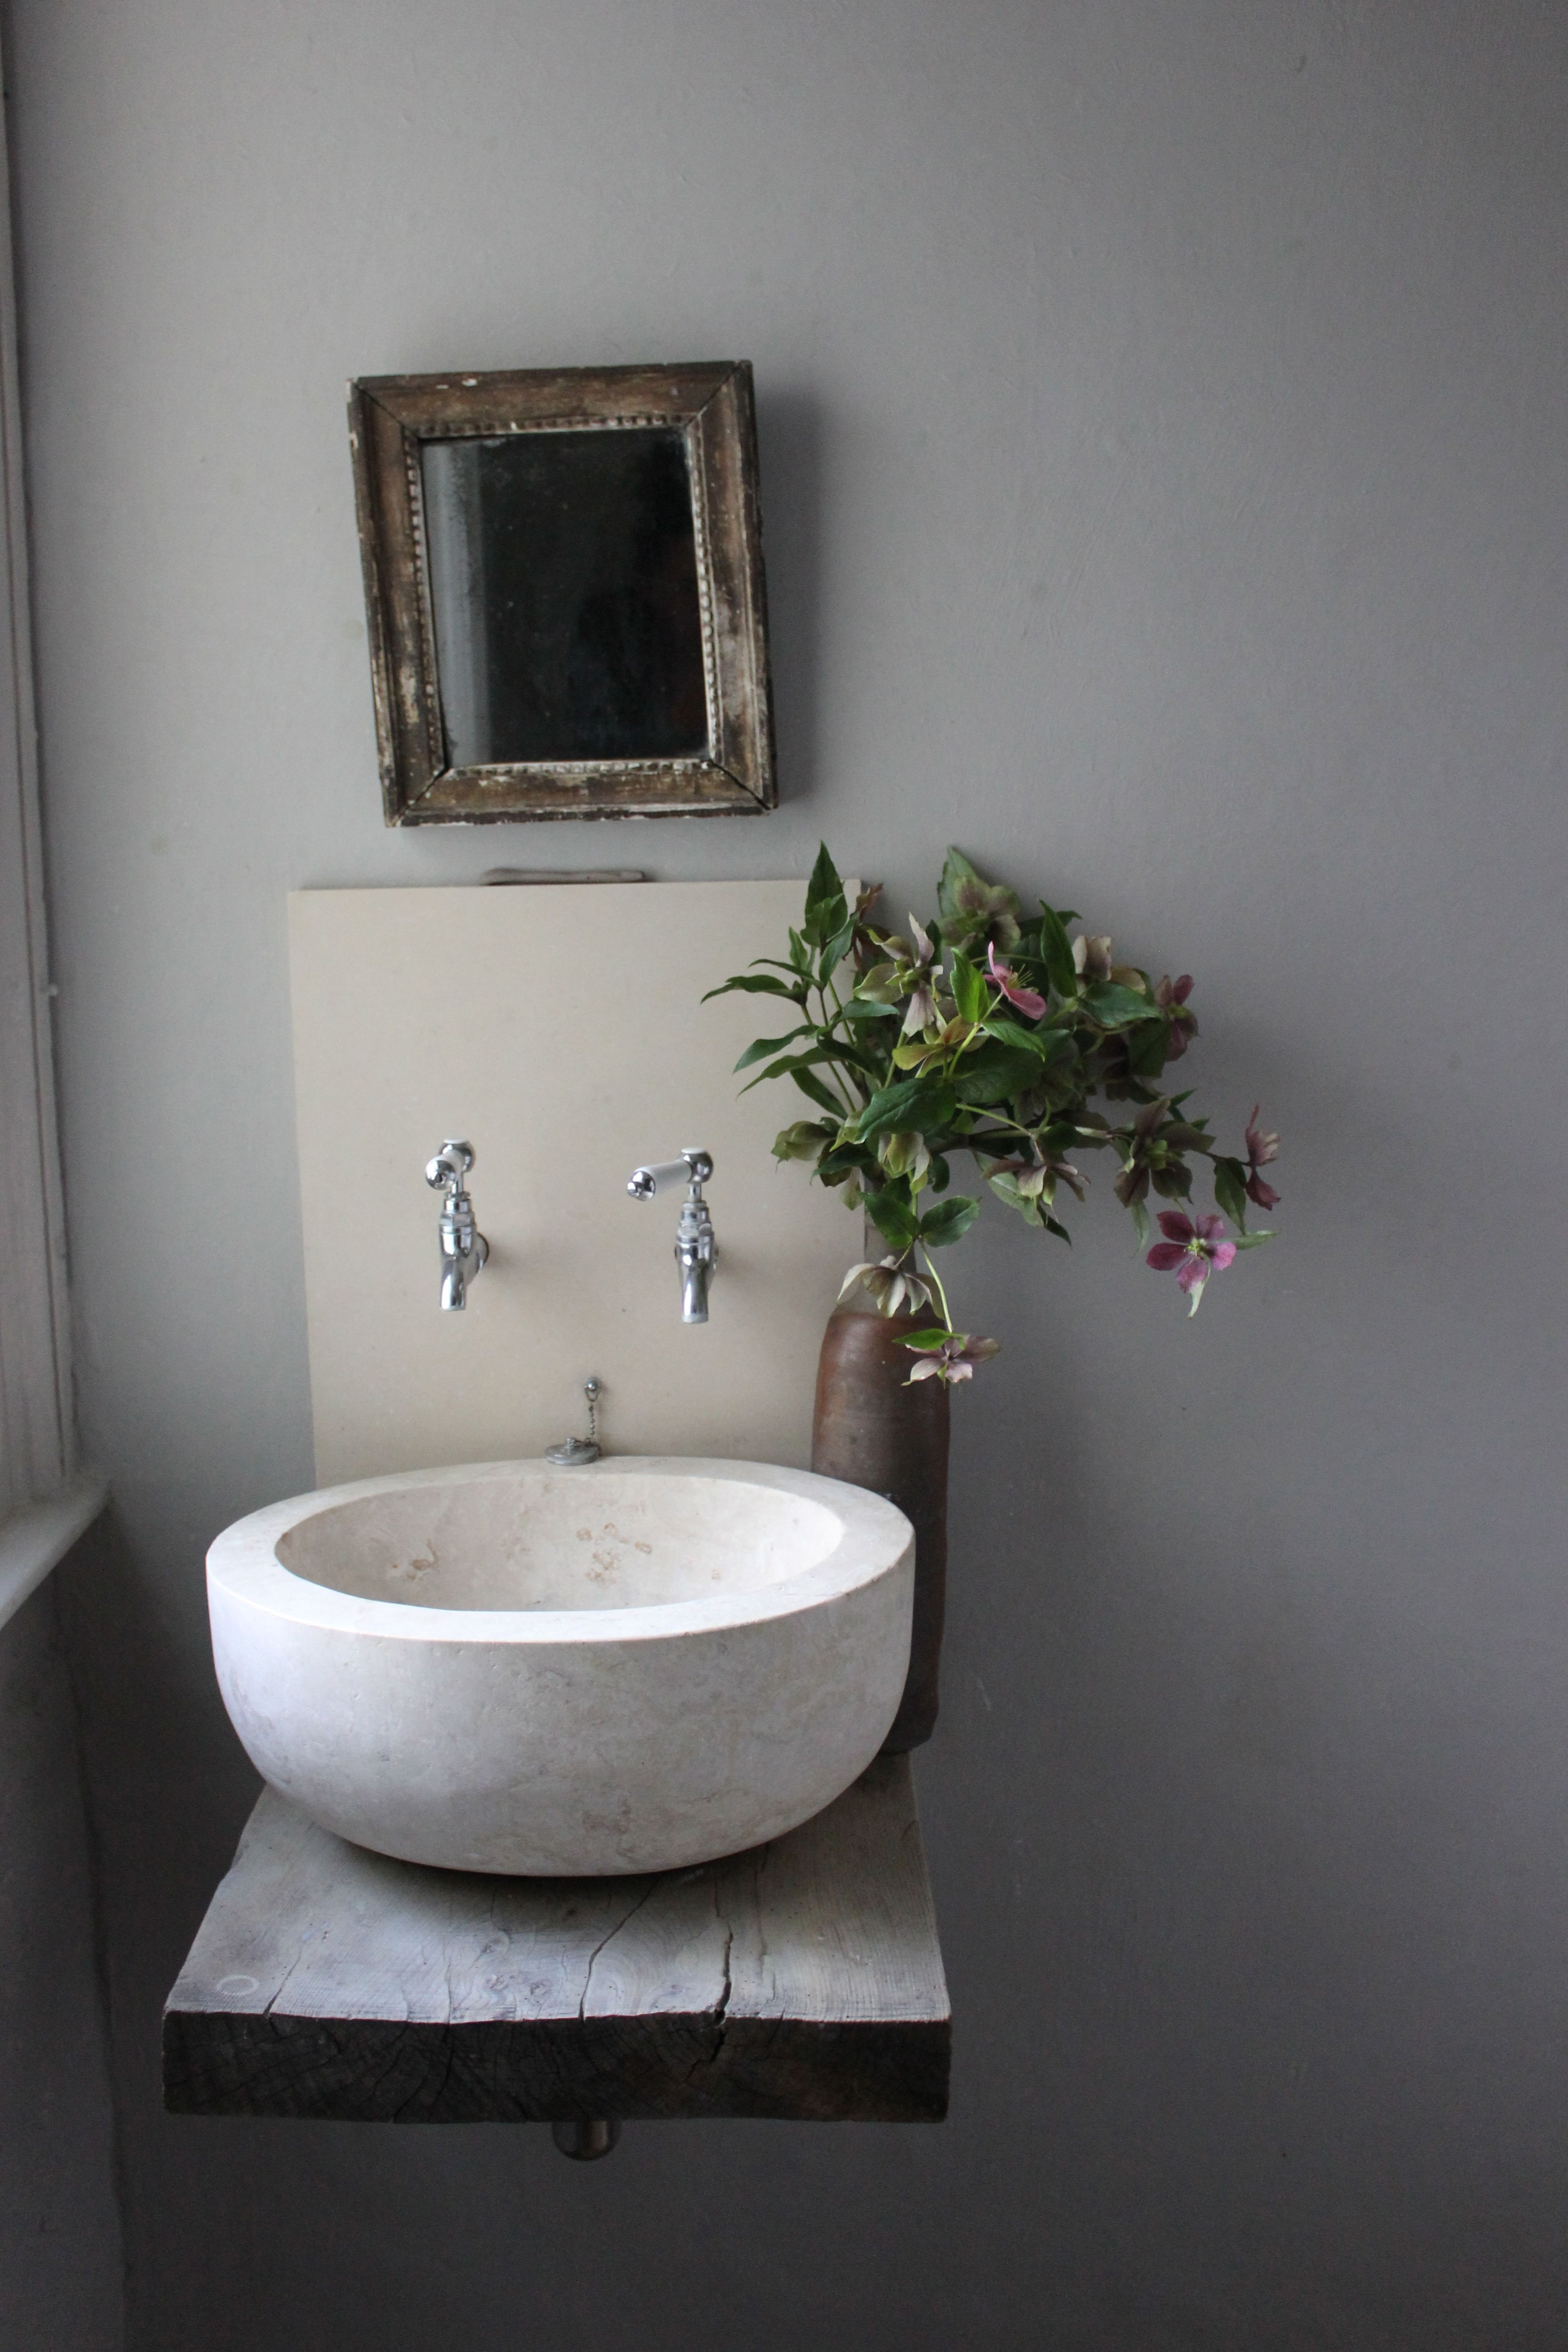 Small Bathroom Sink Ideas: Modern Bathroom Sinks To Accentuate Small Bathroom Design